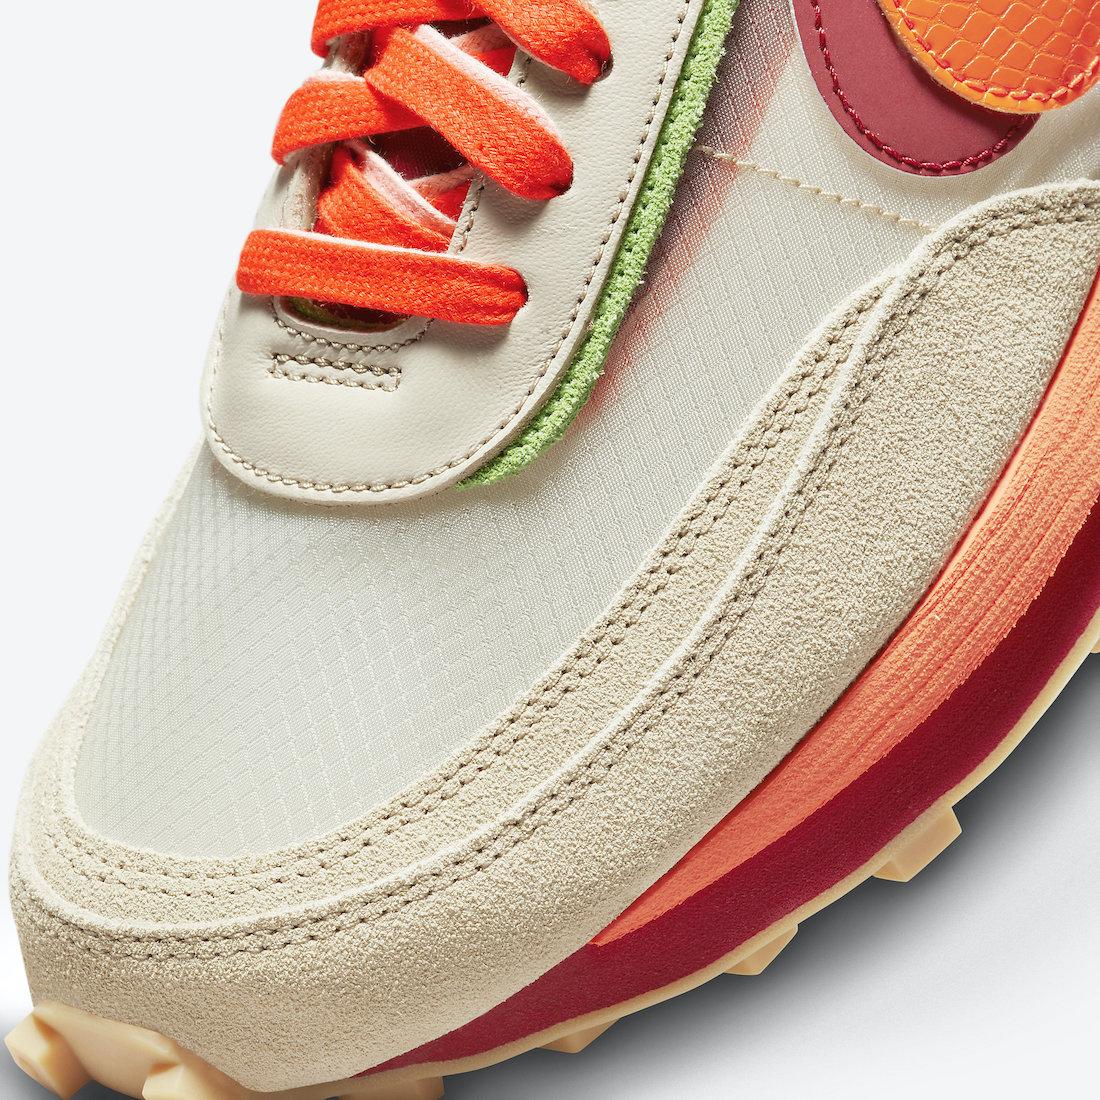 Clot-Sacai-Nike-LDWaffle-Orange-Blaze-DH1347-100-Release-Date-6